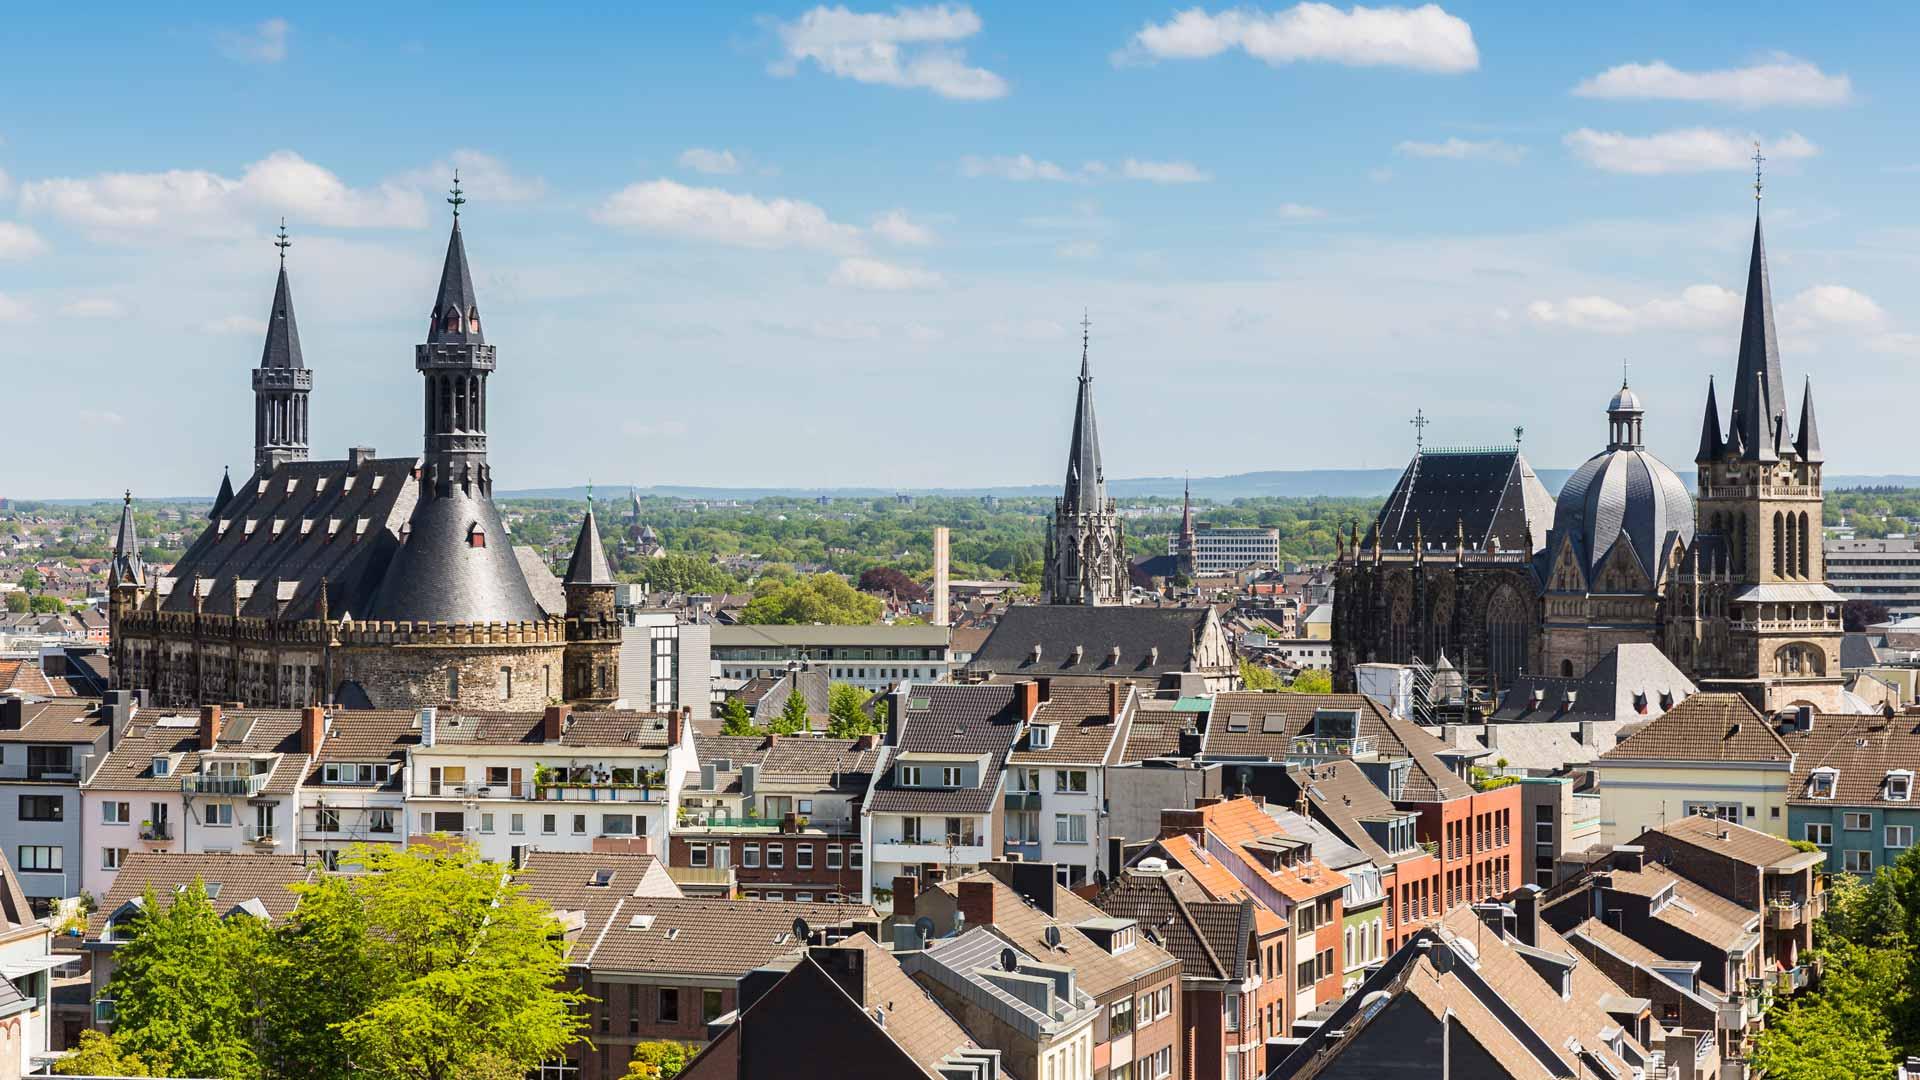 Automatencasino Aachen